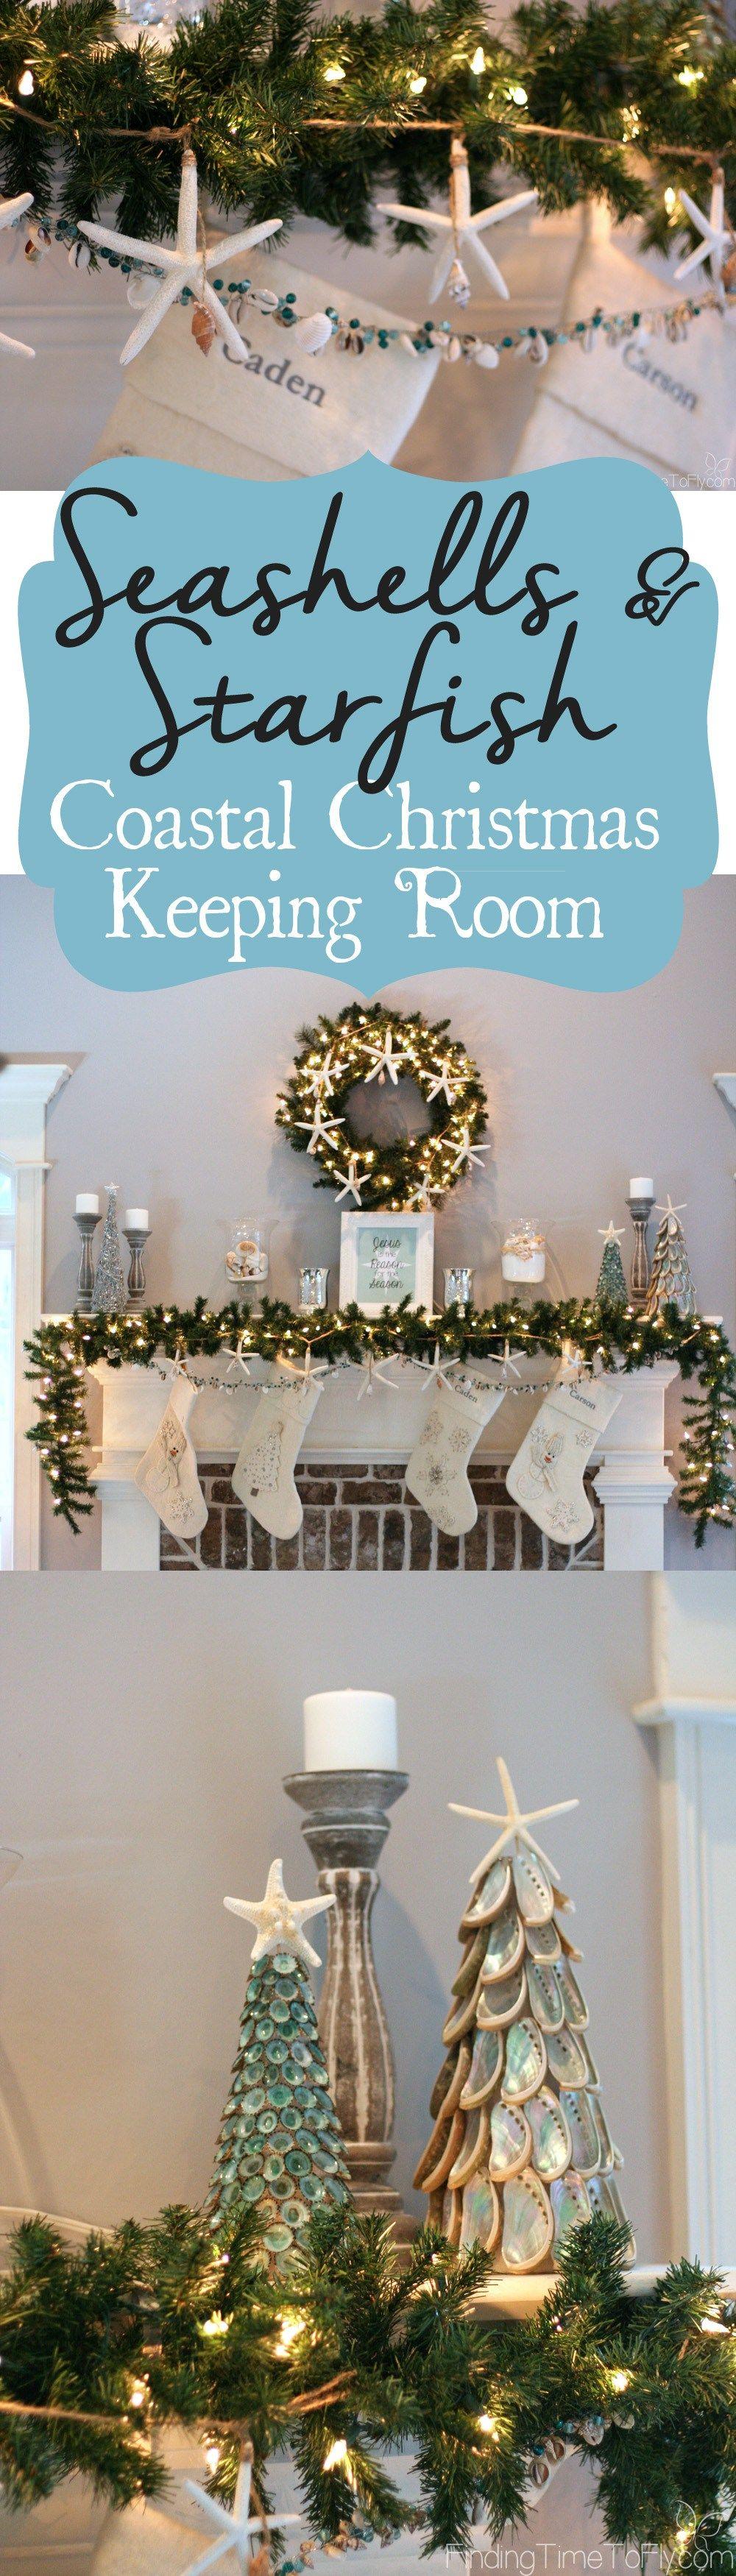 Seashells and Starfish Coastal Christmas Keeping Room